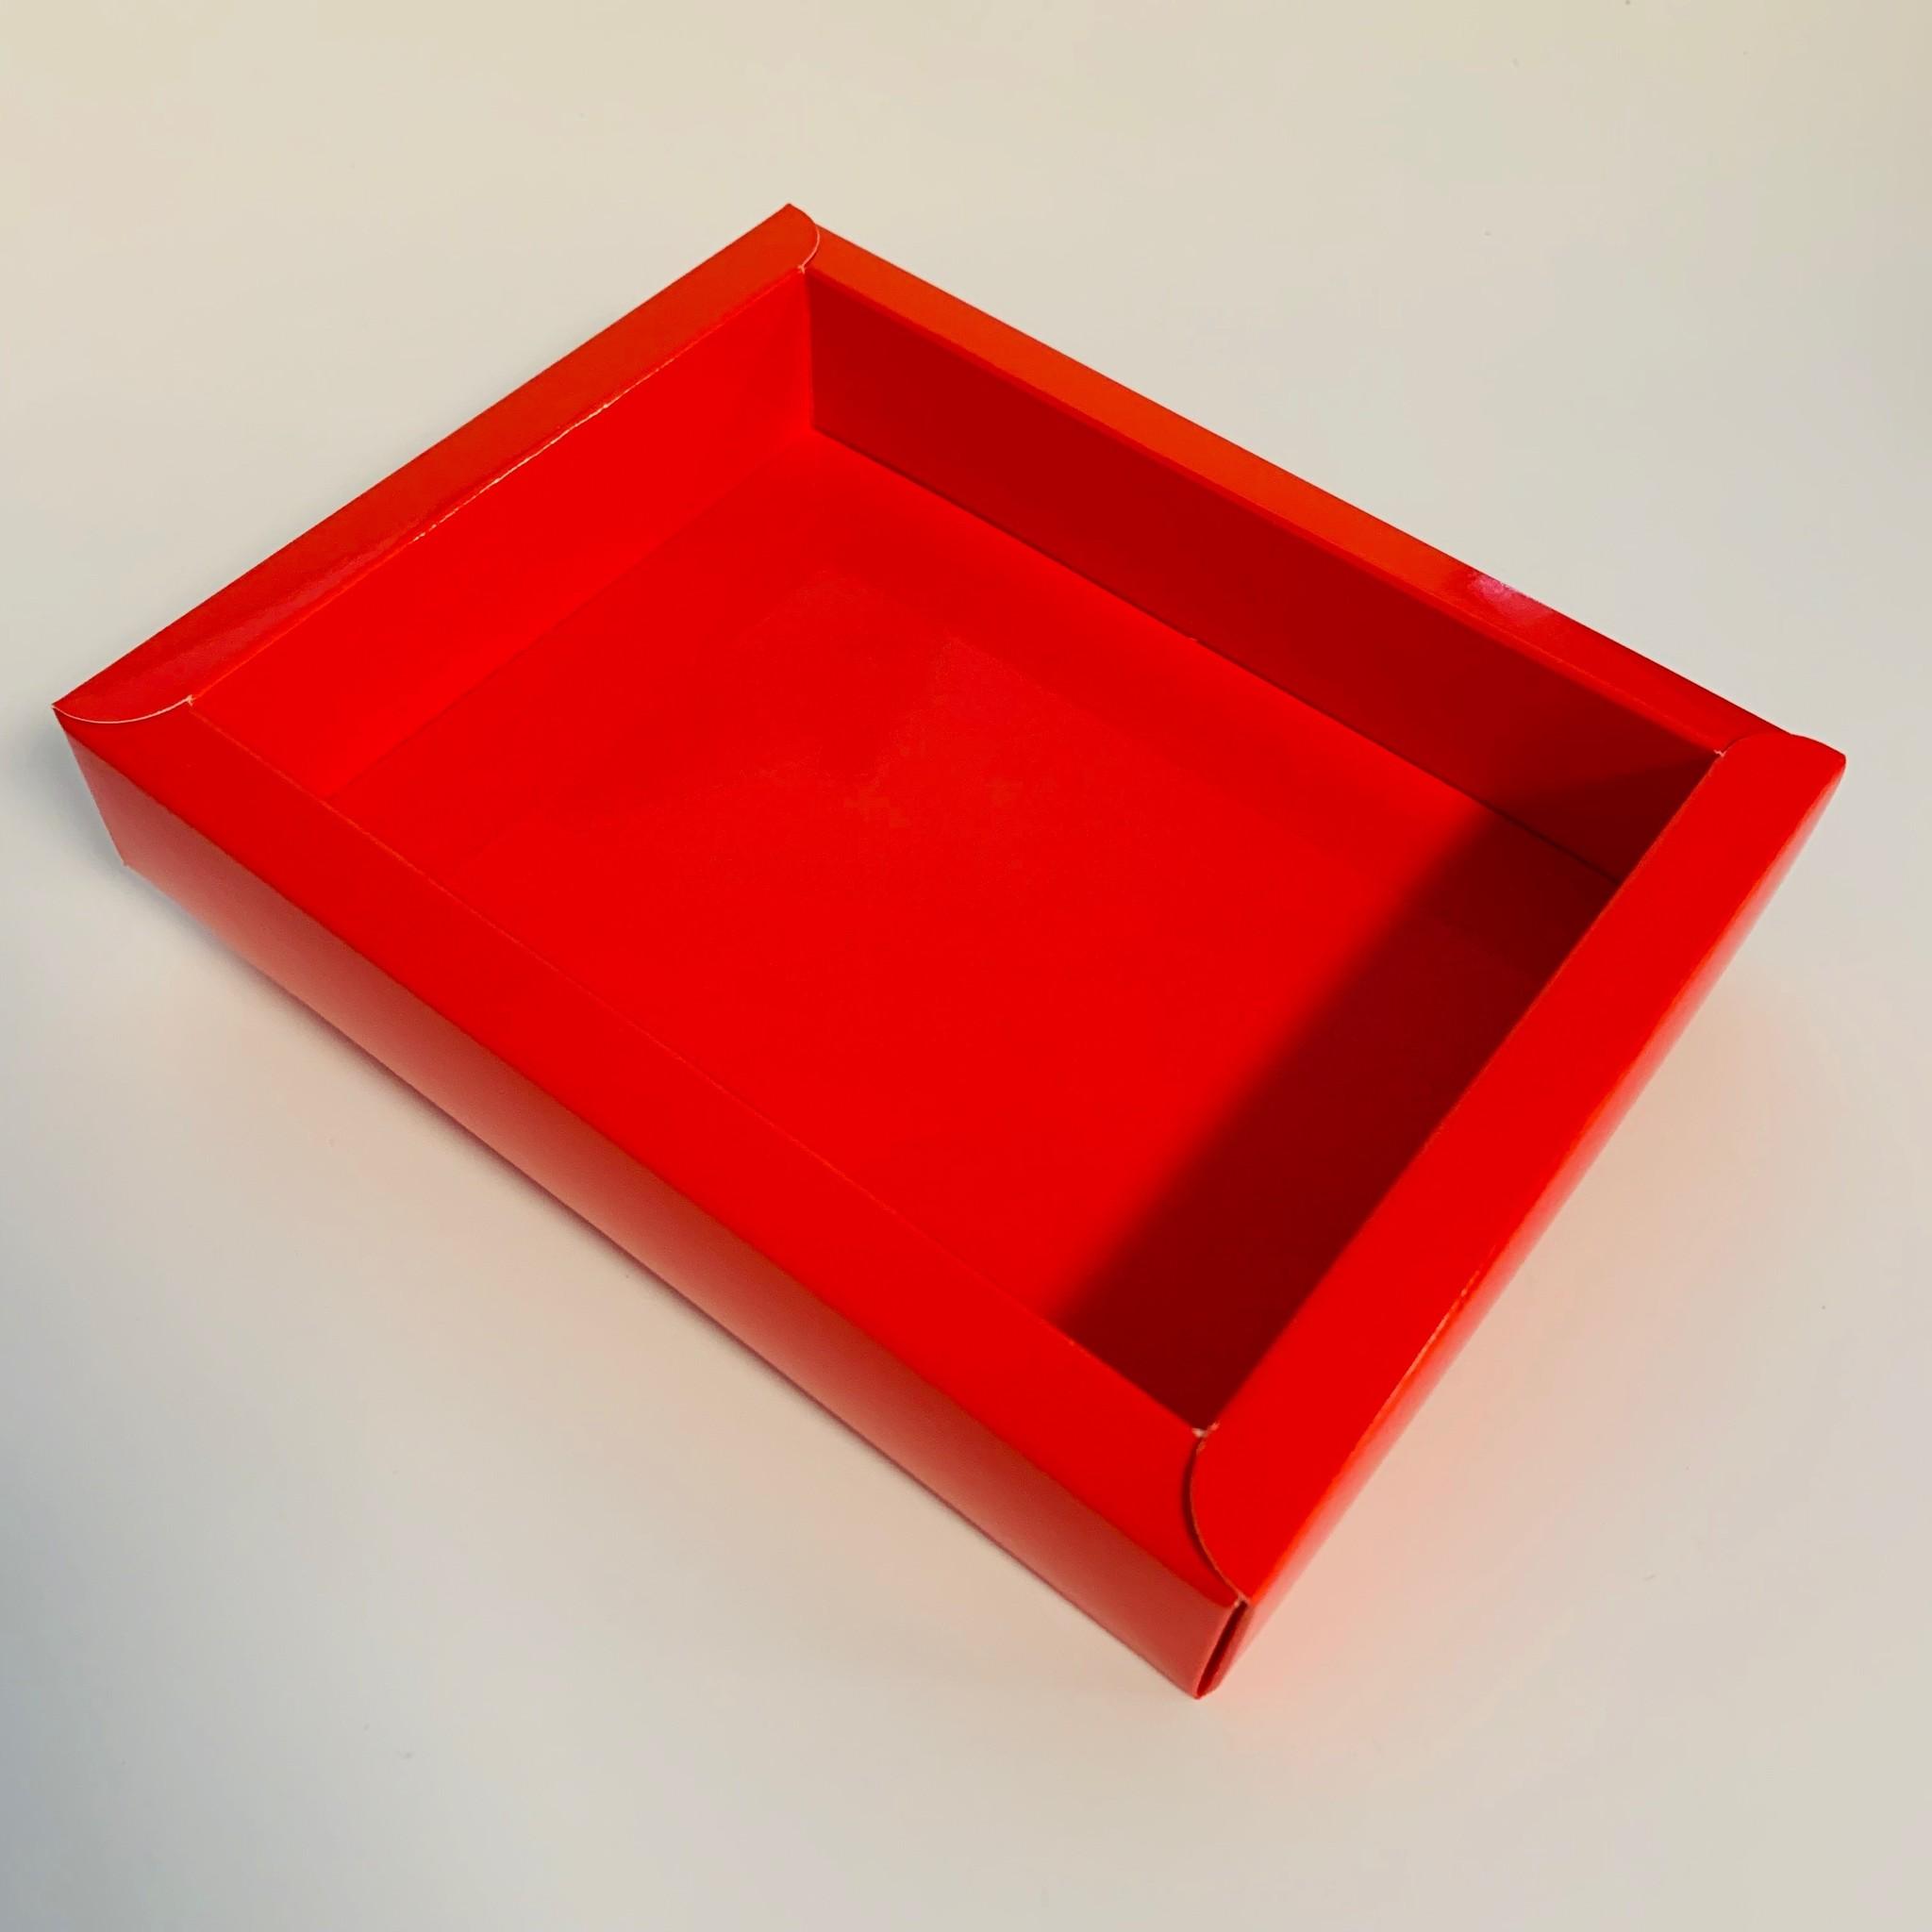 Hollewand verpakking NR.4 inhoud:150x110x30mm